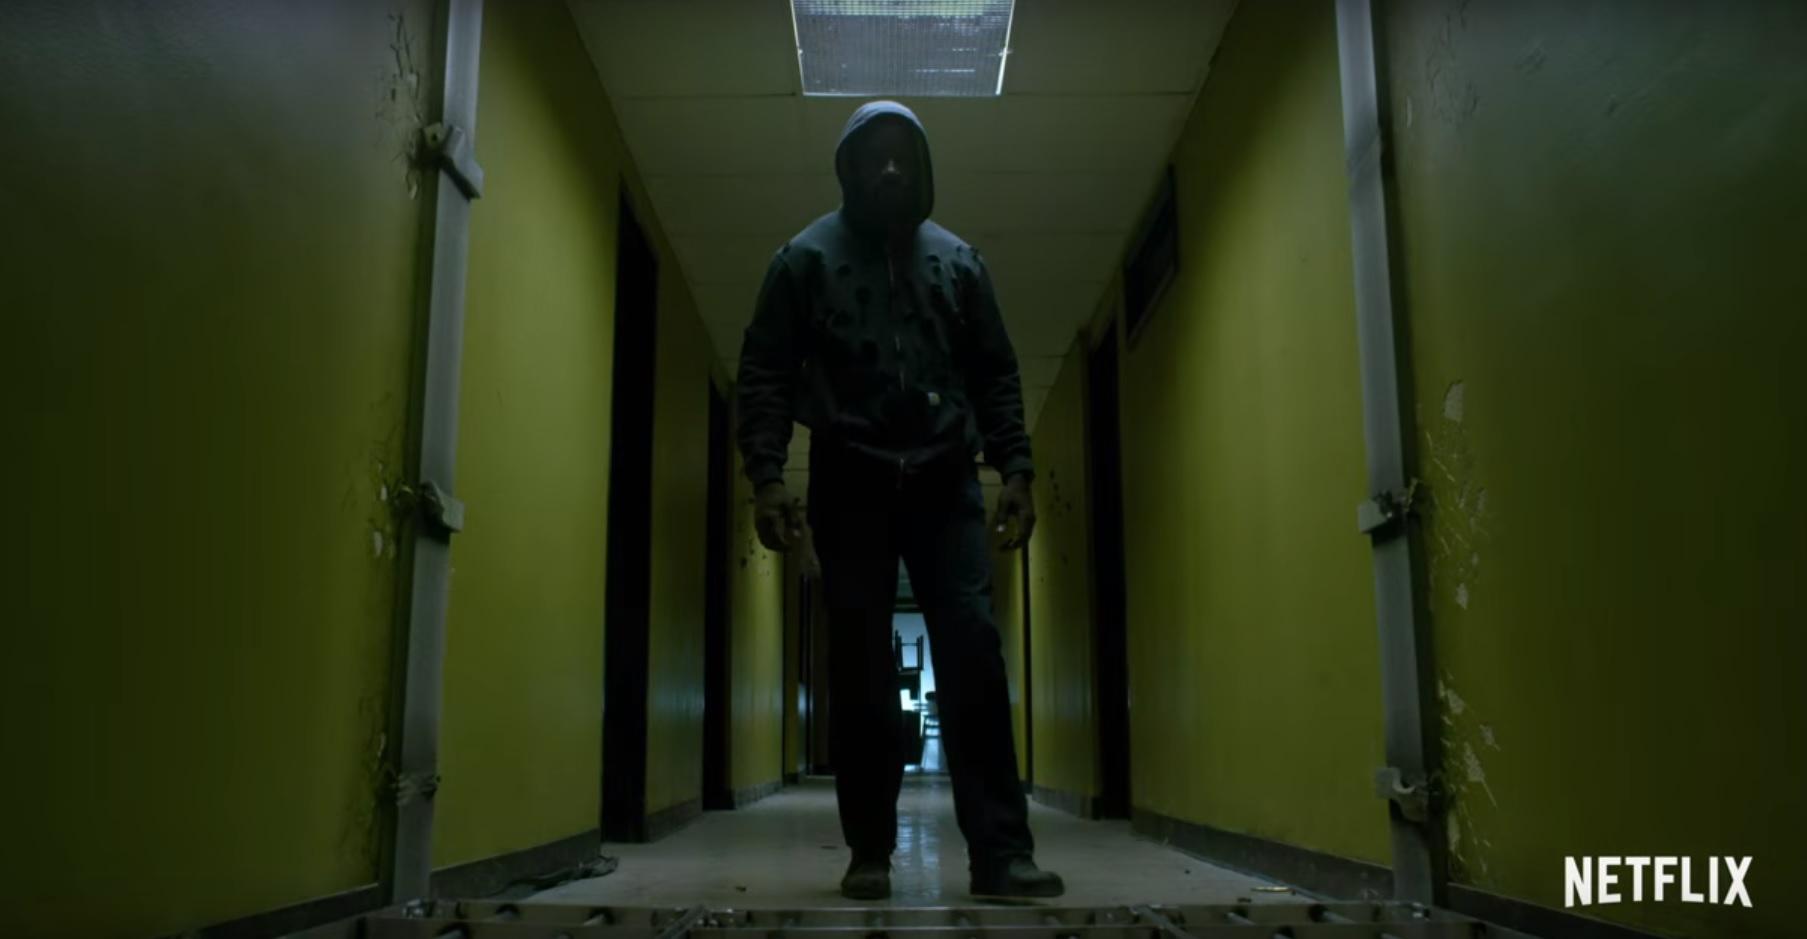 Luke Cage w akcji w nowym teaserze serialu